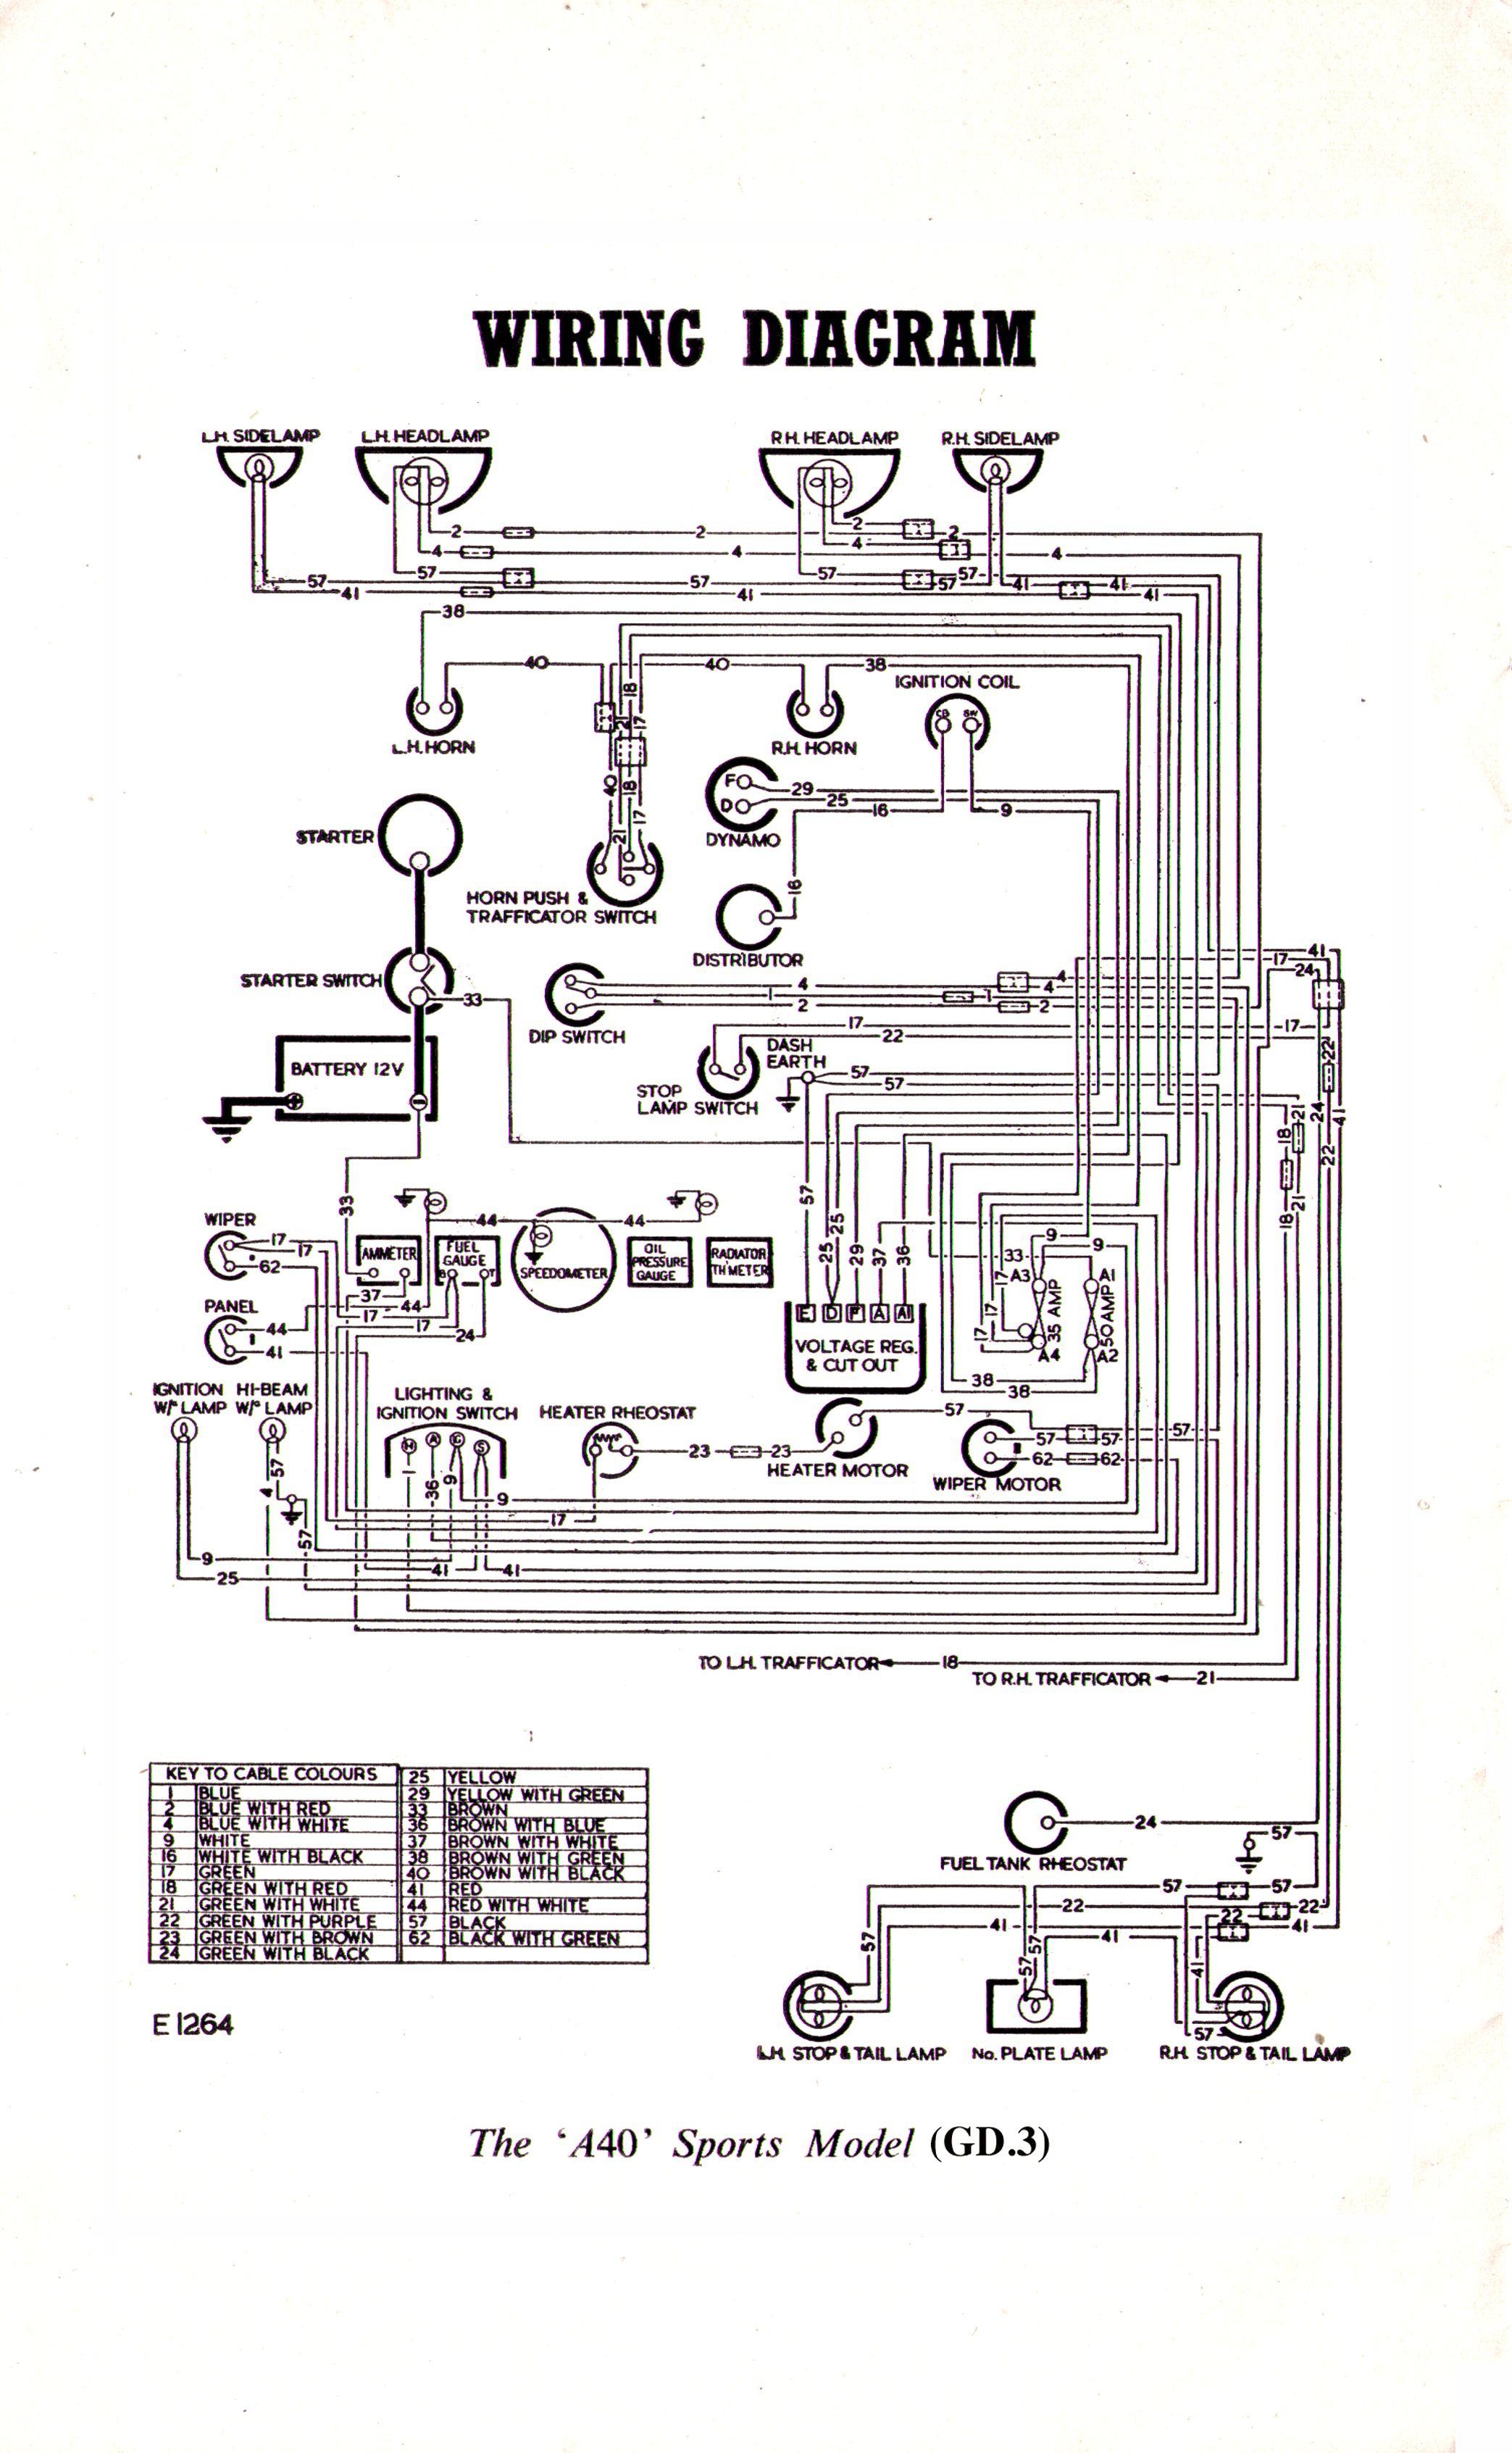 A35 Engine Diagram | Wiring Diagram on